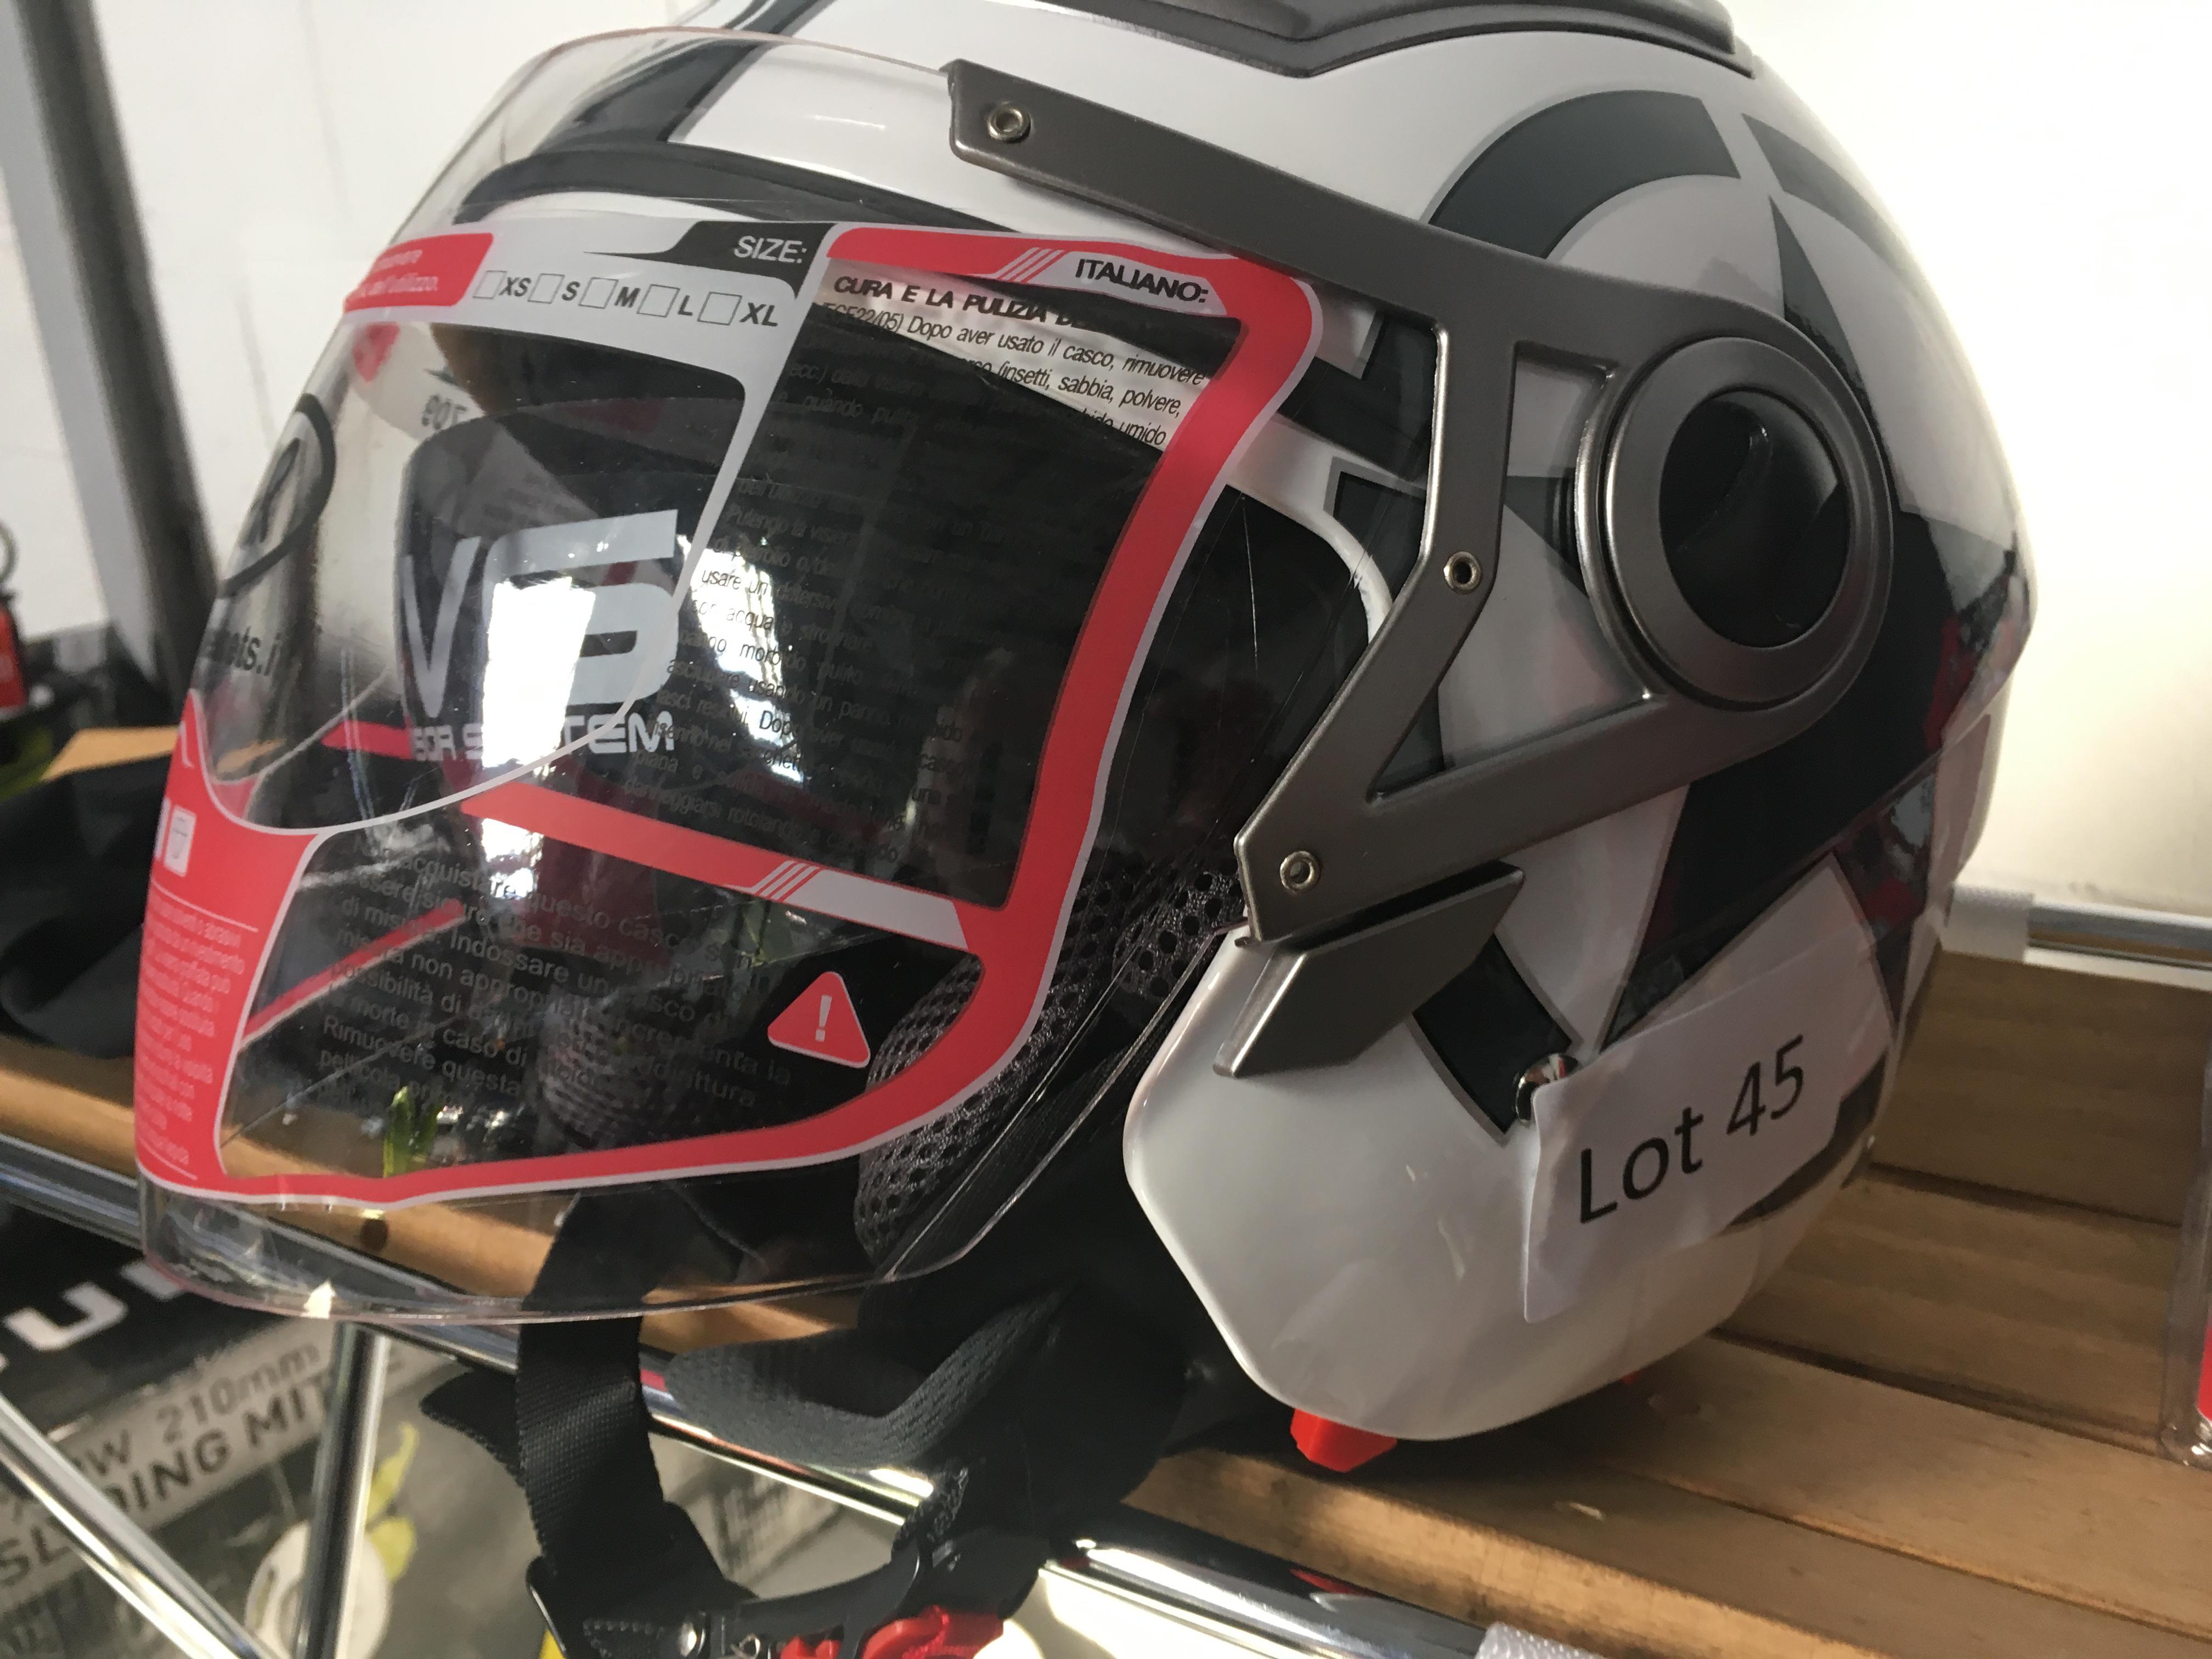 Lot 45 - BHR white / grey motocycle helmet. New.